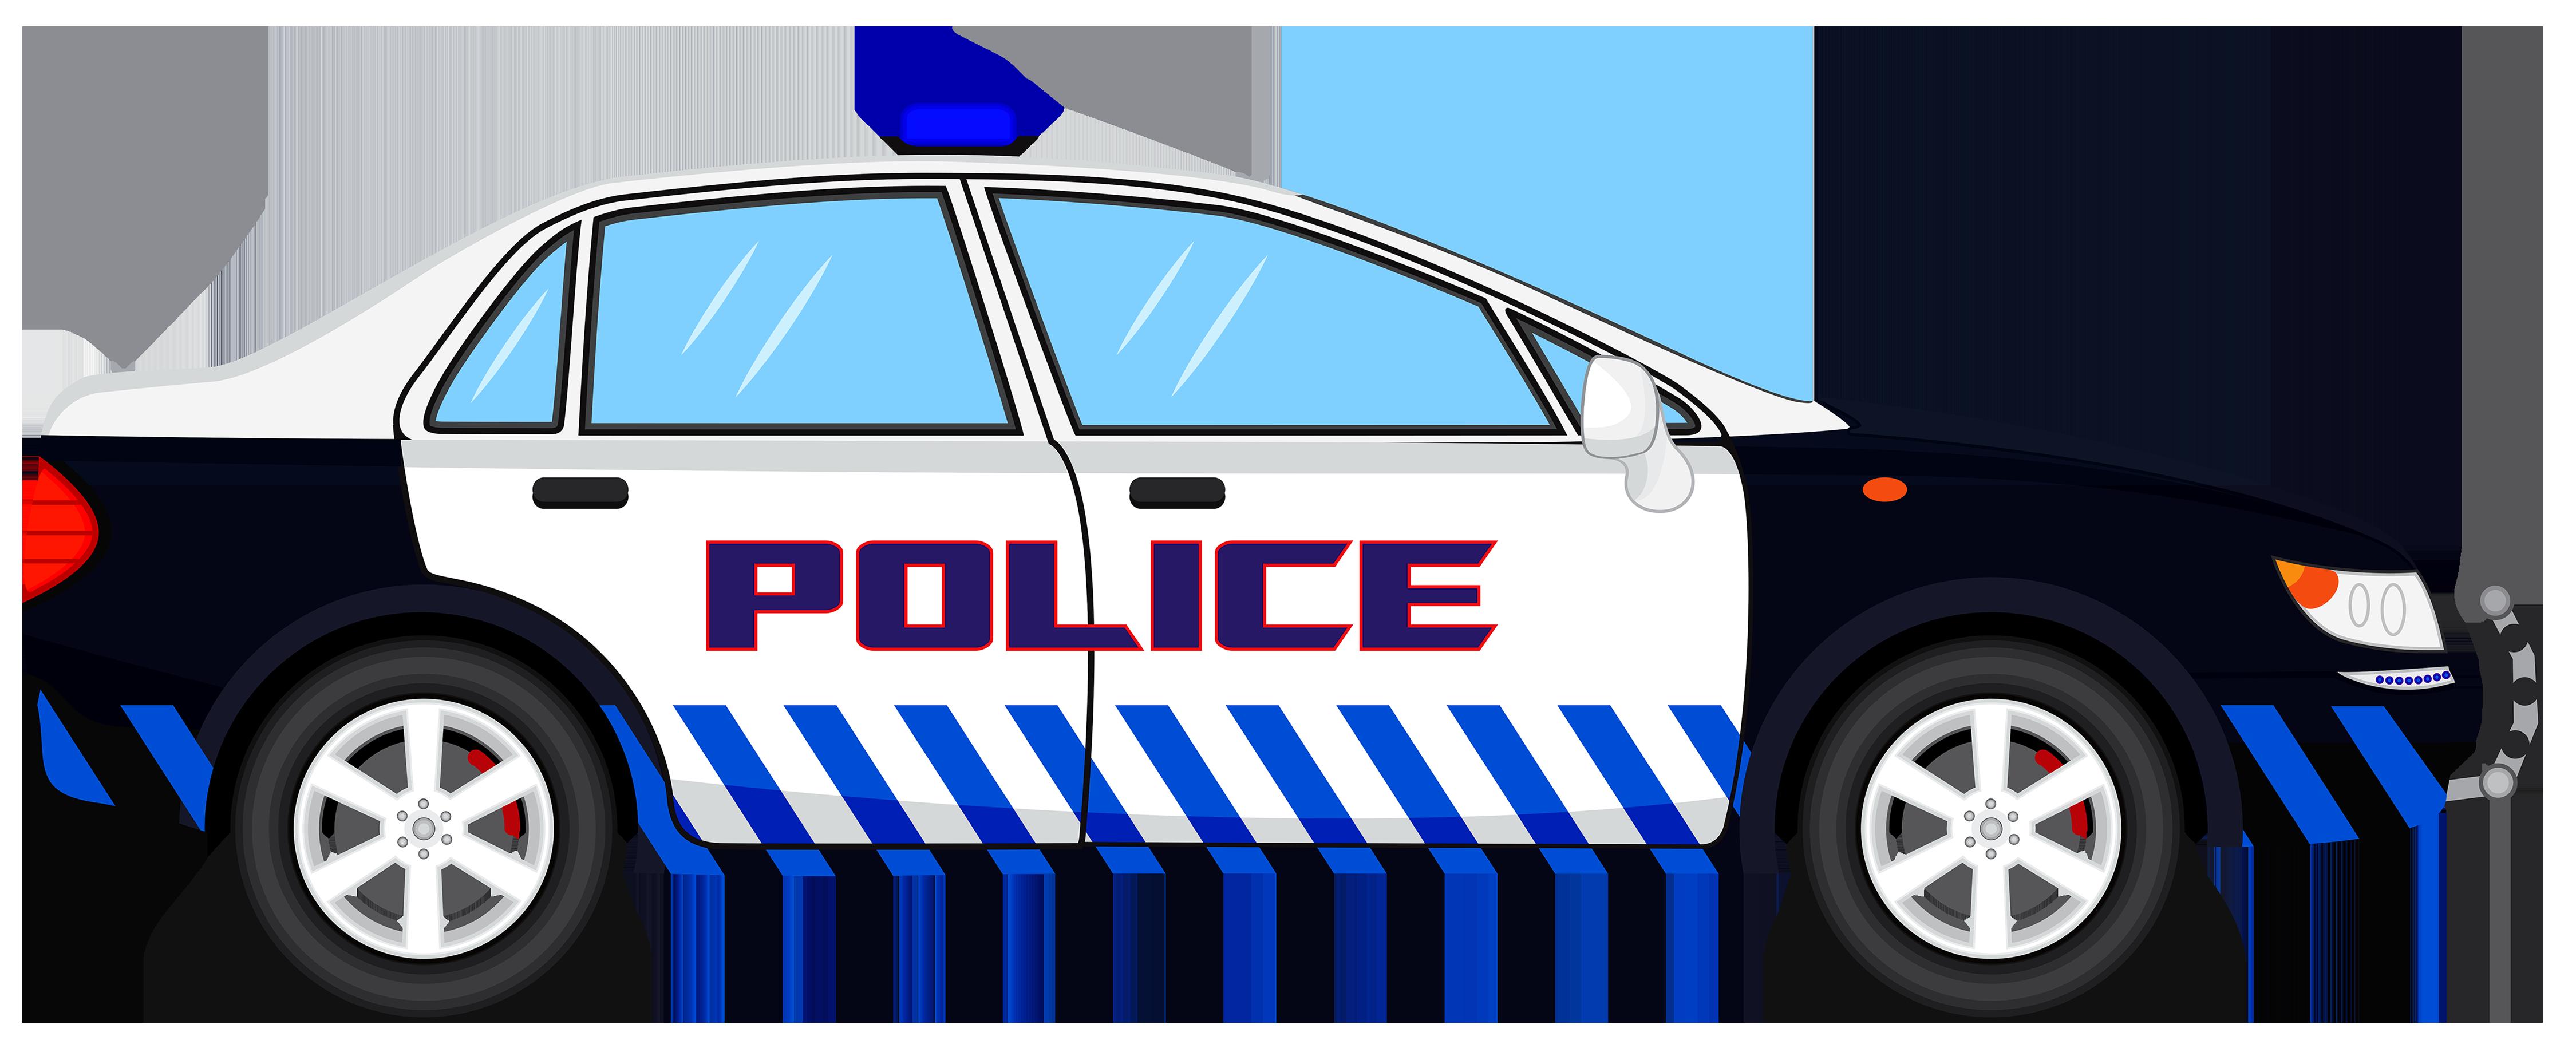 4500x1817 Police Clipart Police Van